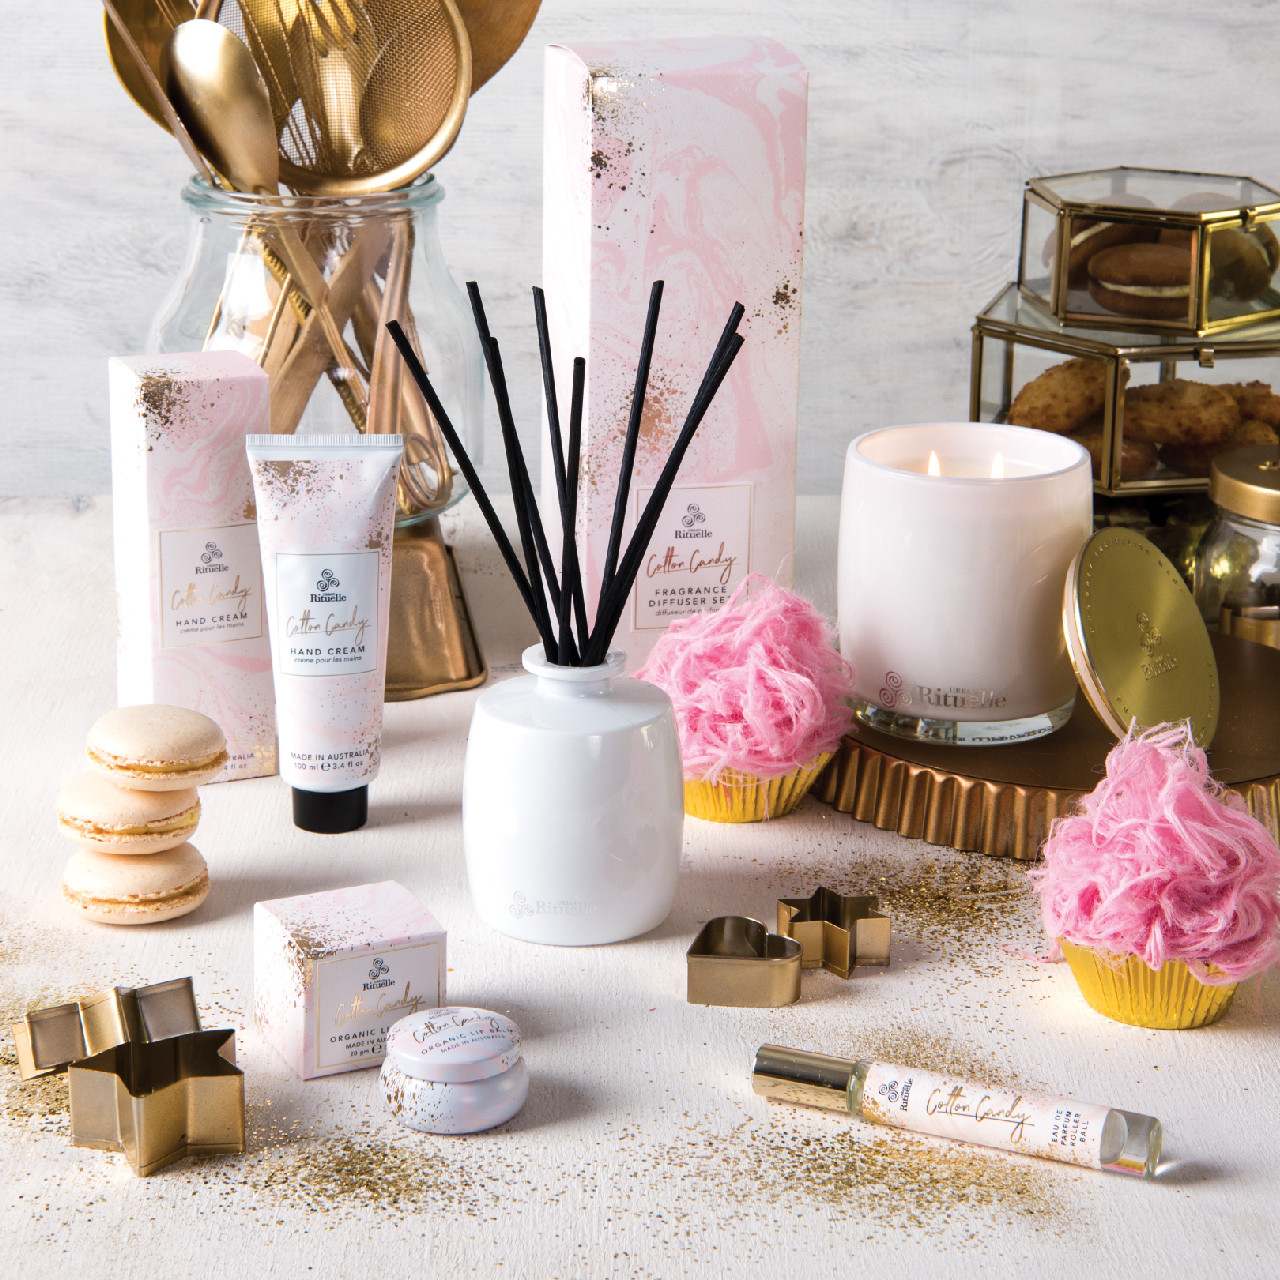 Sweet Treats - Cotton Candy - Sweet Delights Gift Set - Urban Rituelle